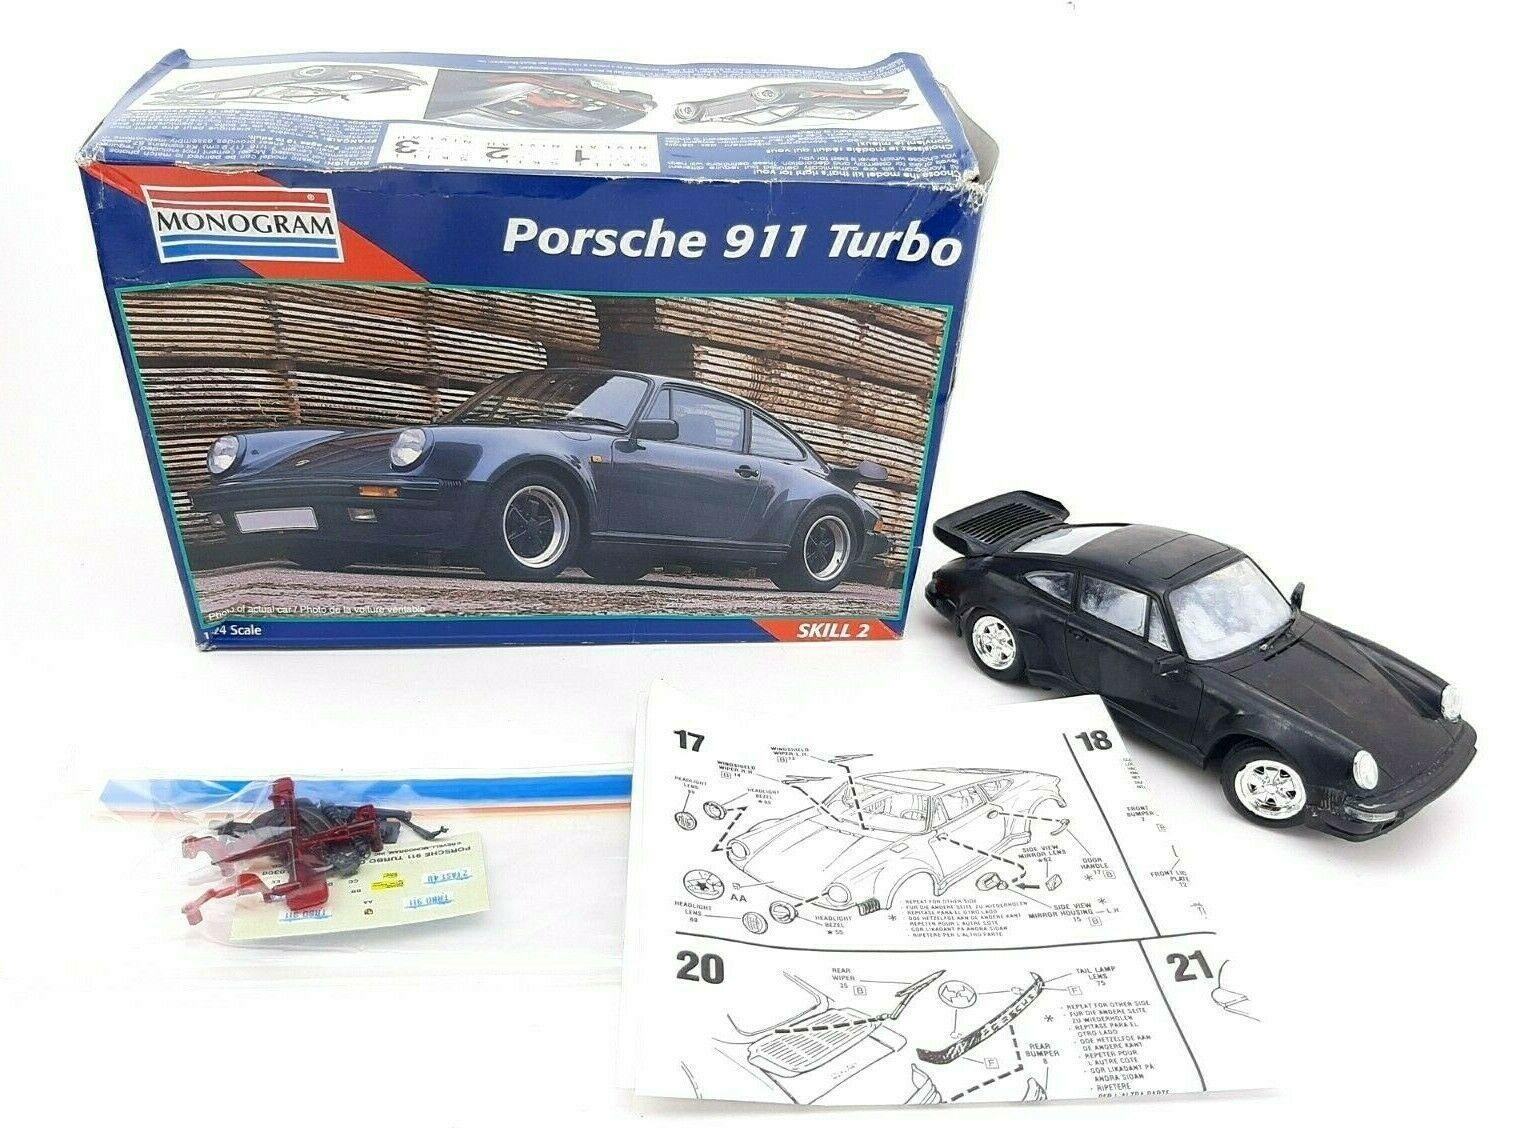 Porsche 911 Turbo 1/24 Scale Monogram  - $11.35